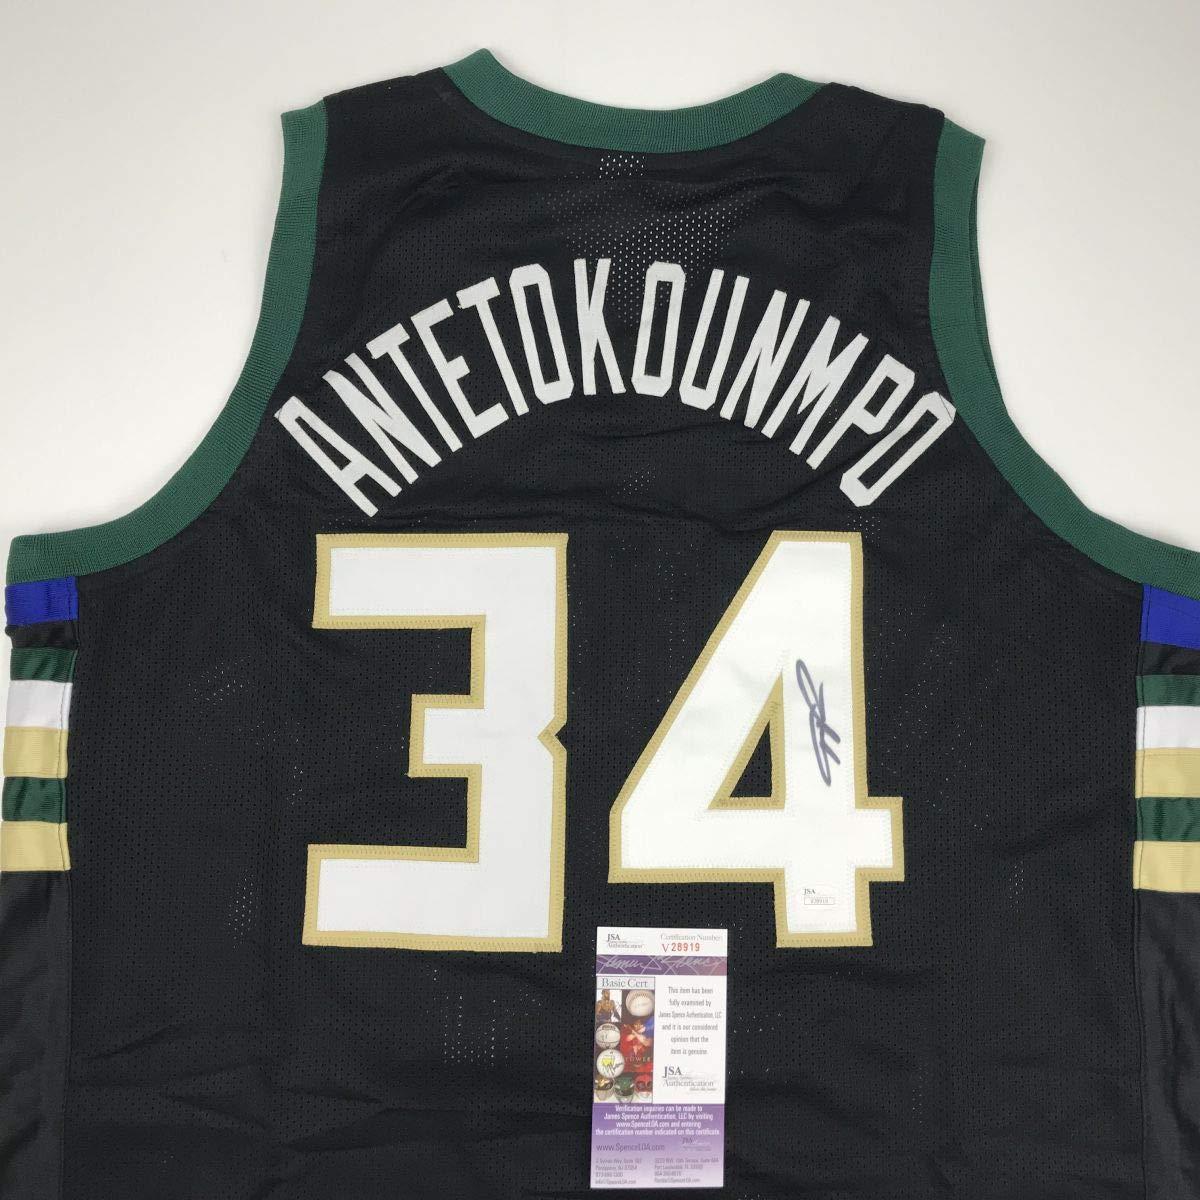 f2ef09949 Autographed Signed Giannis Antetokounmpo Milwaukee Black Custom Basketball Jersey  JSA COA